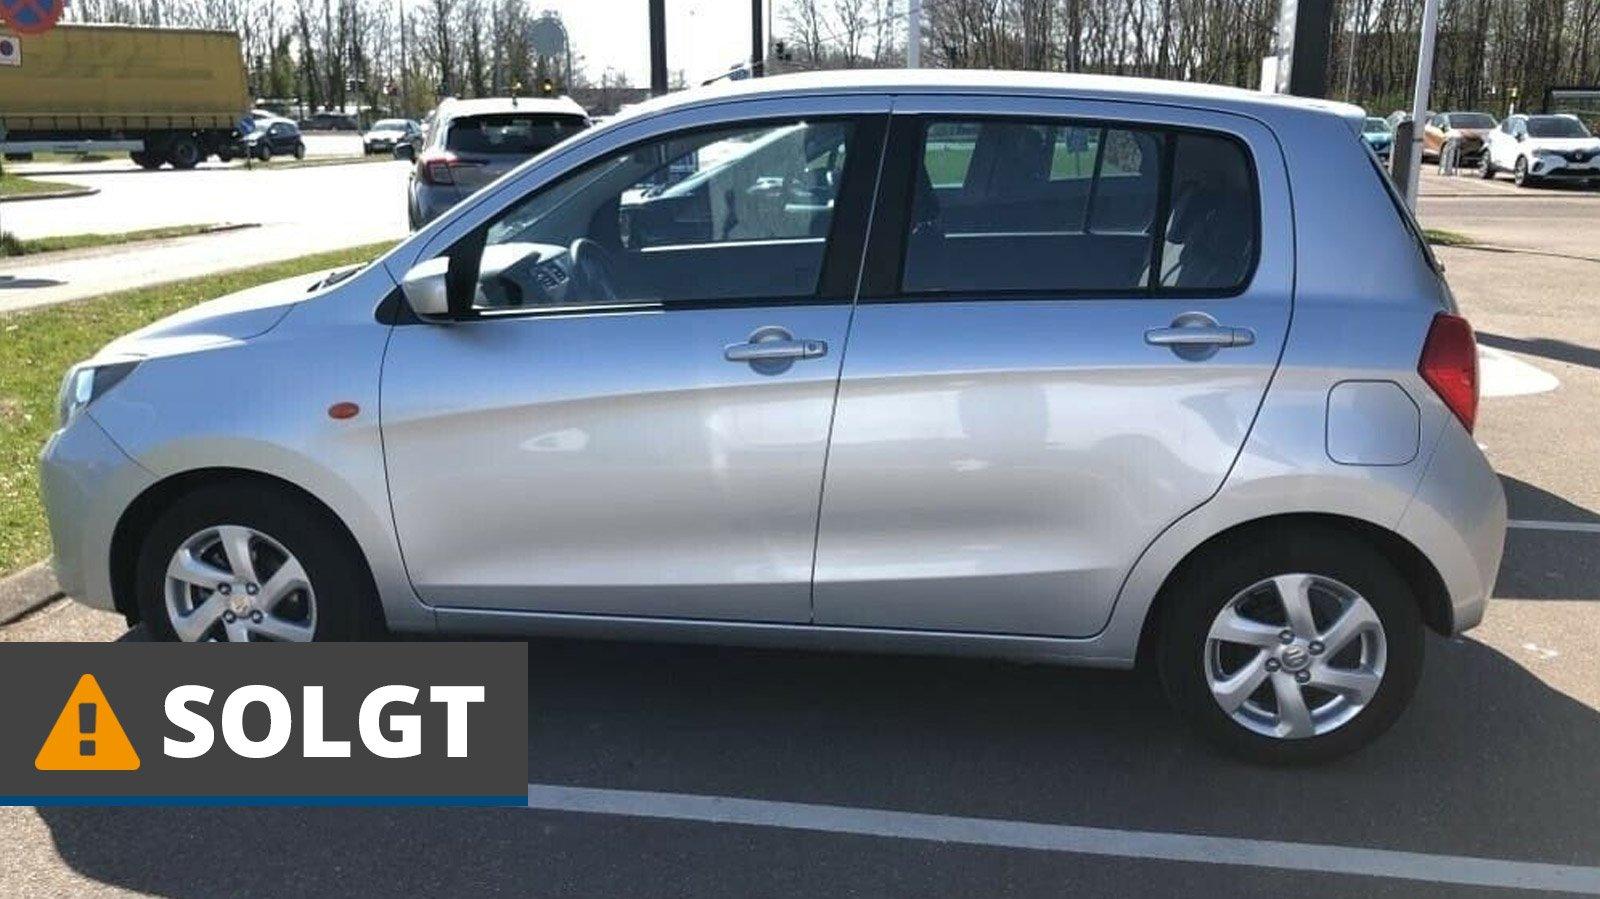 Suzuki Celerio Dualjet Exclusive 1,0 Benzin 68 Hk (2018) // SOLGT